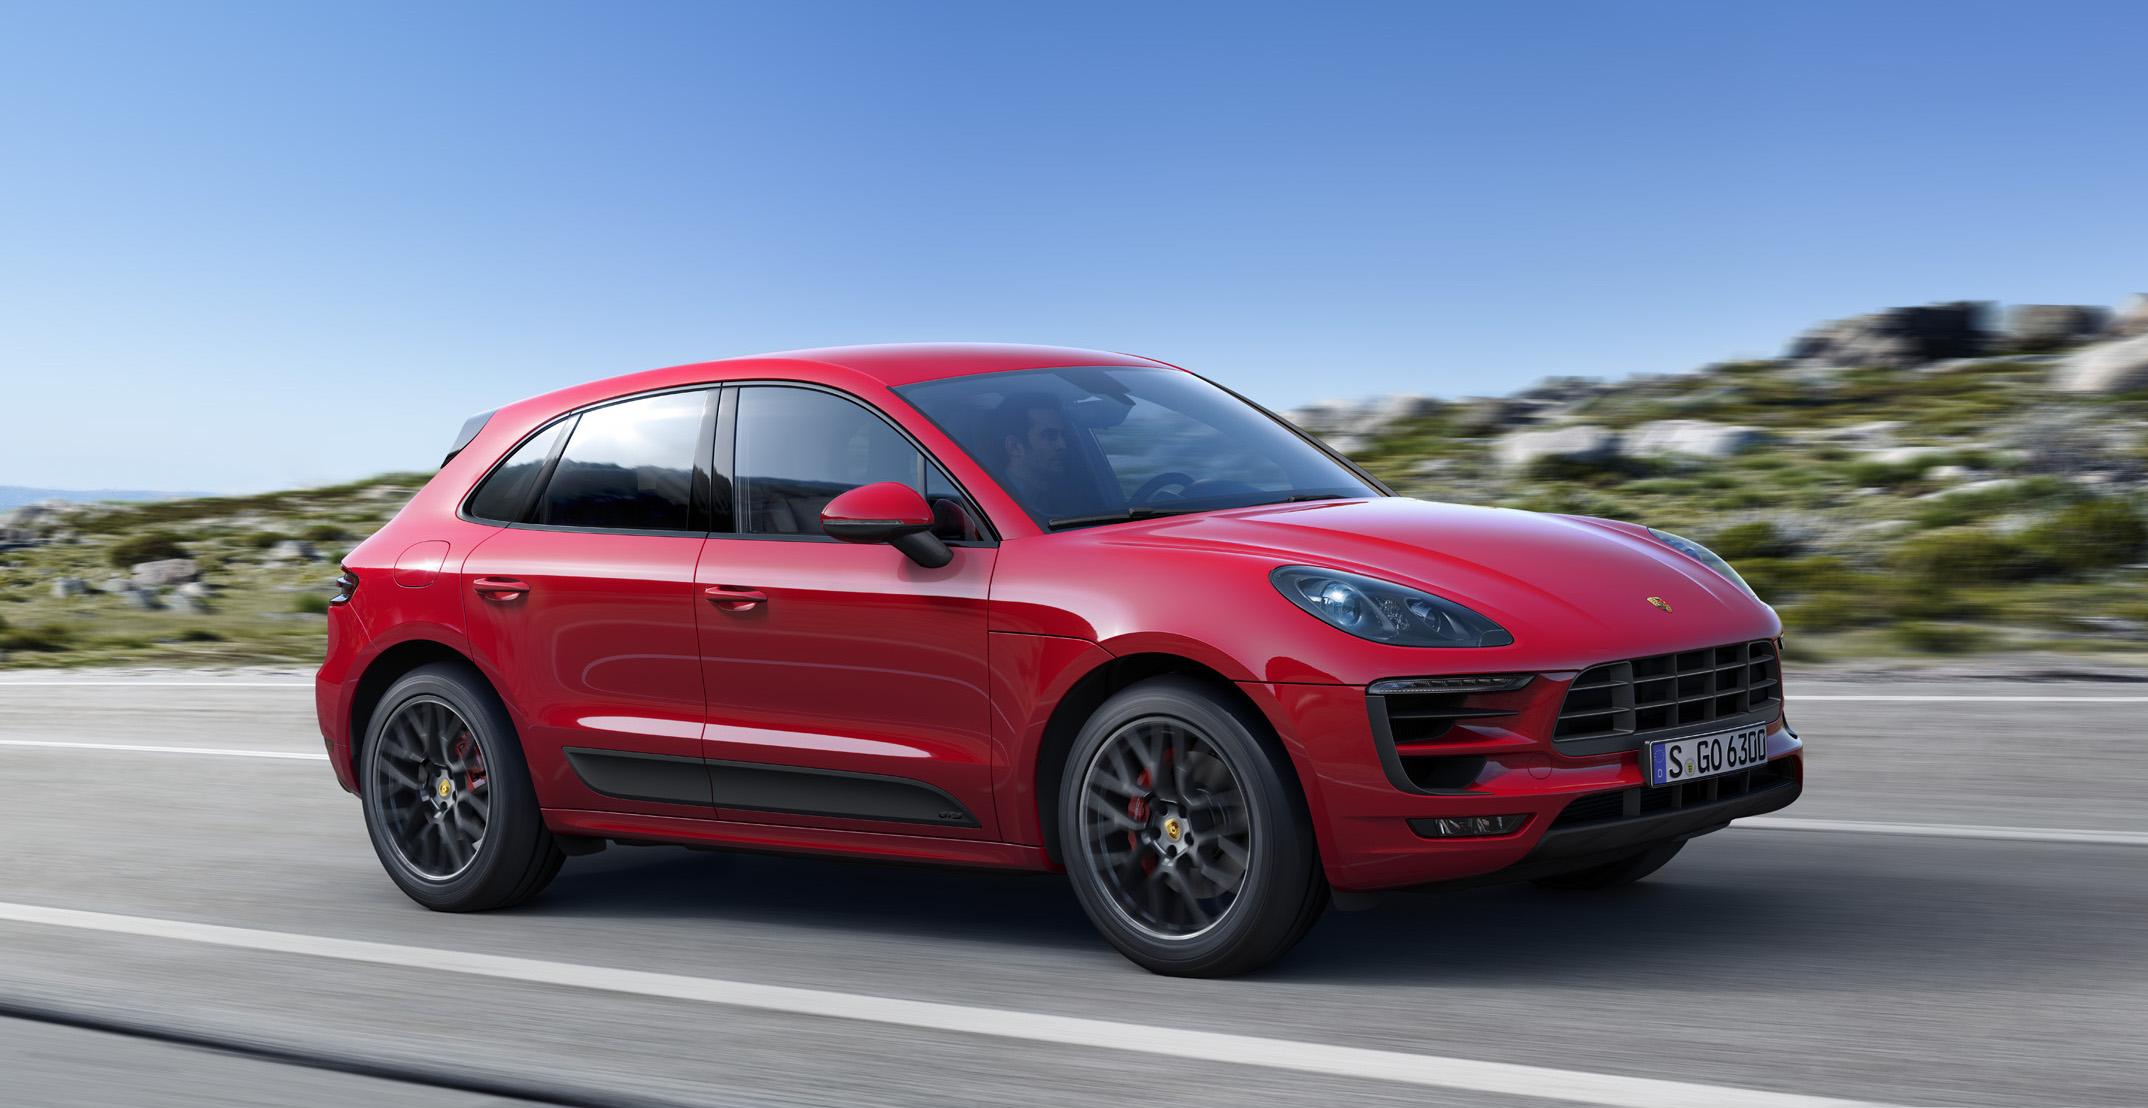 A red 2018 Porsche Macan, a low-slung 5 passenger crossover SUV.